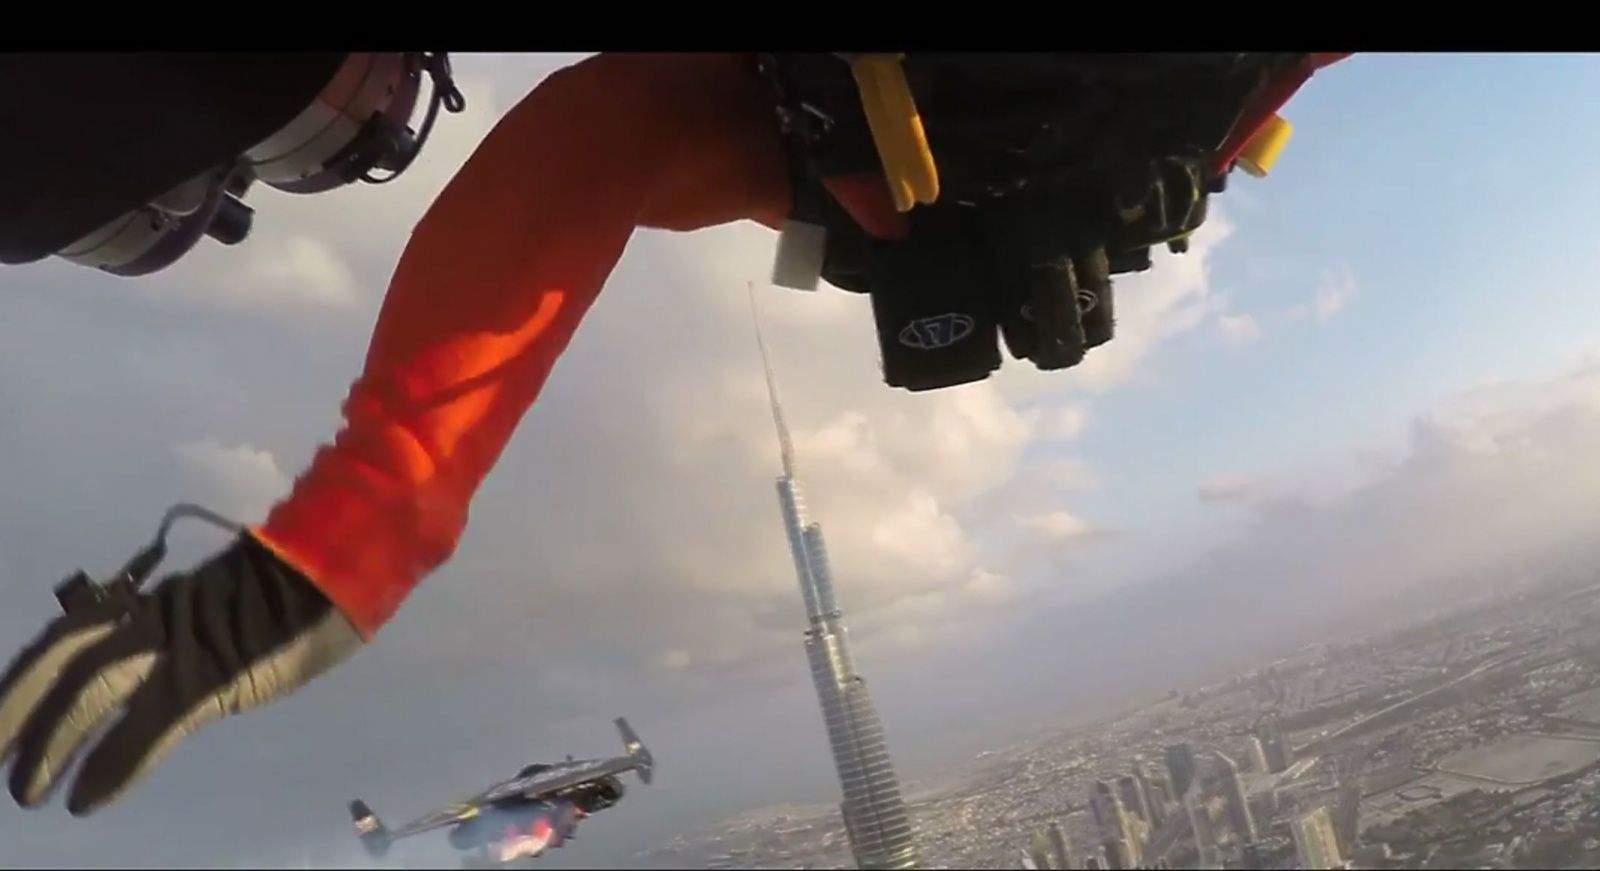 Jetman Yves Rossy and his new stuntman sidekick Vince Reffet fly in formation over Dubai. Photo: XDubai/YouTube